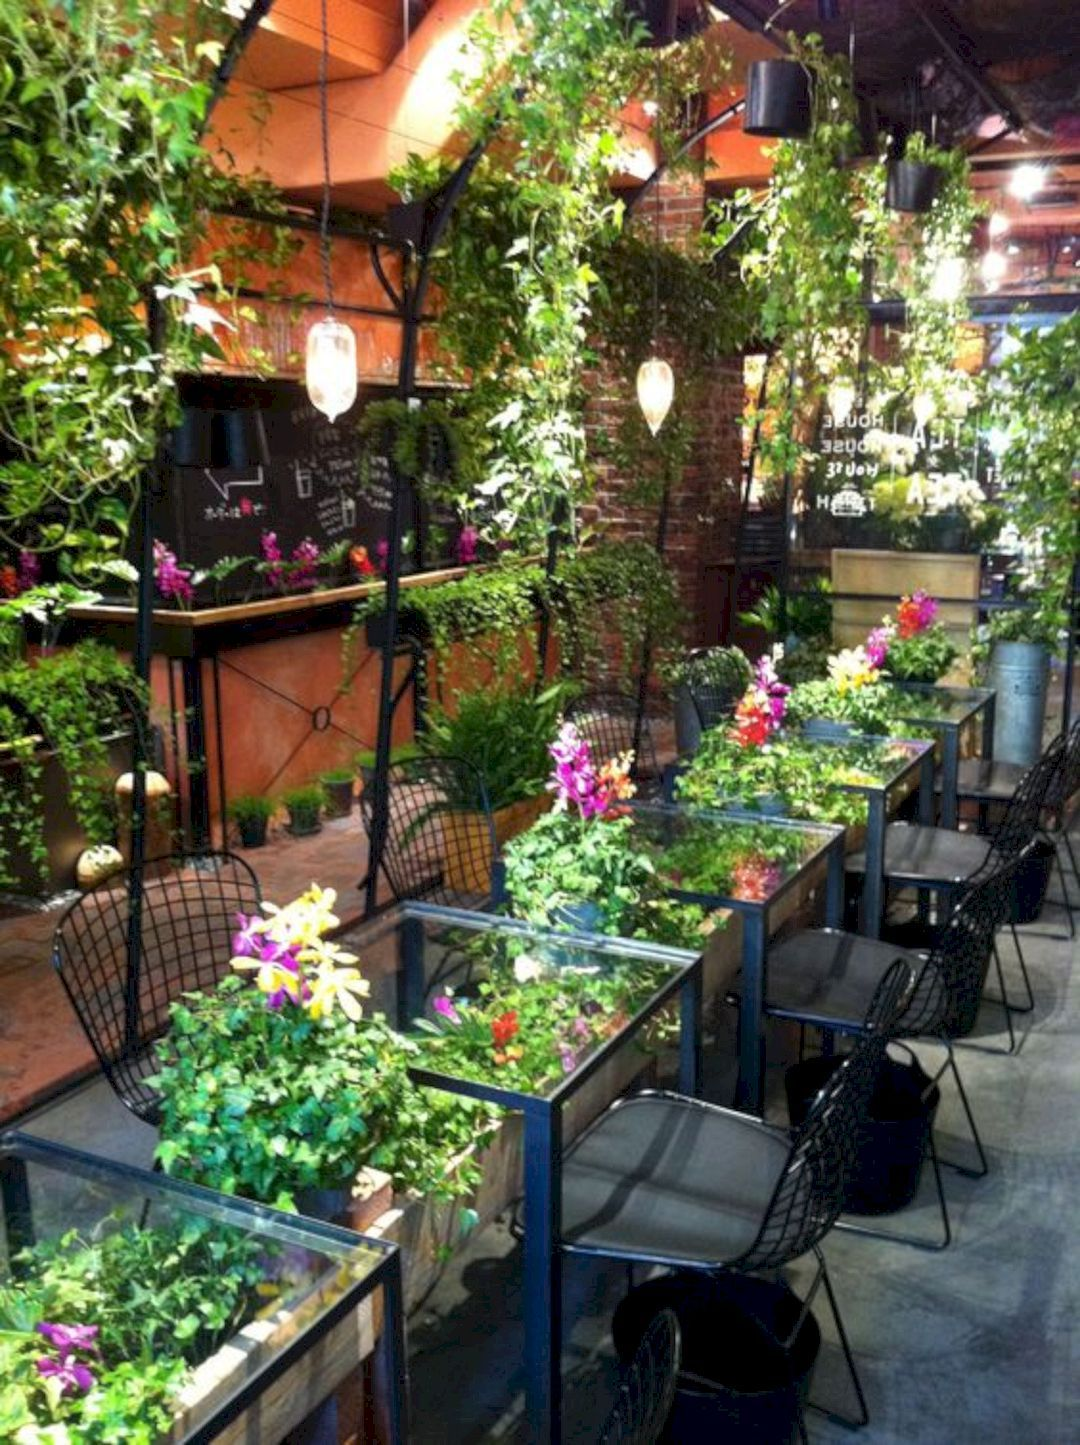 15 Café Shop Interior Design ideas to Lure Customers   Cafes, Shop ...